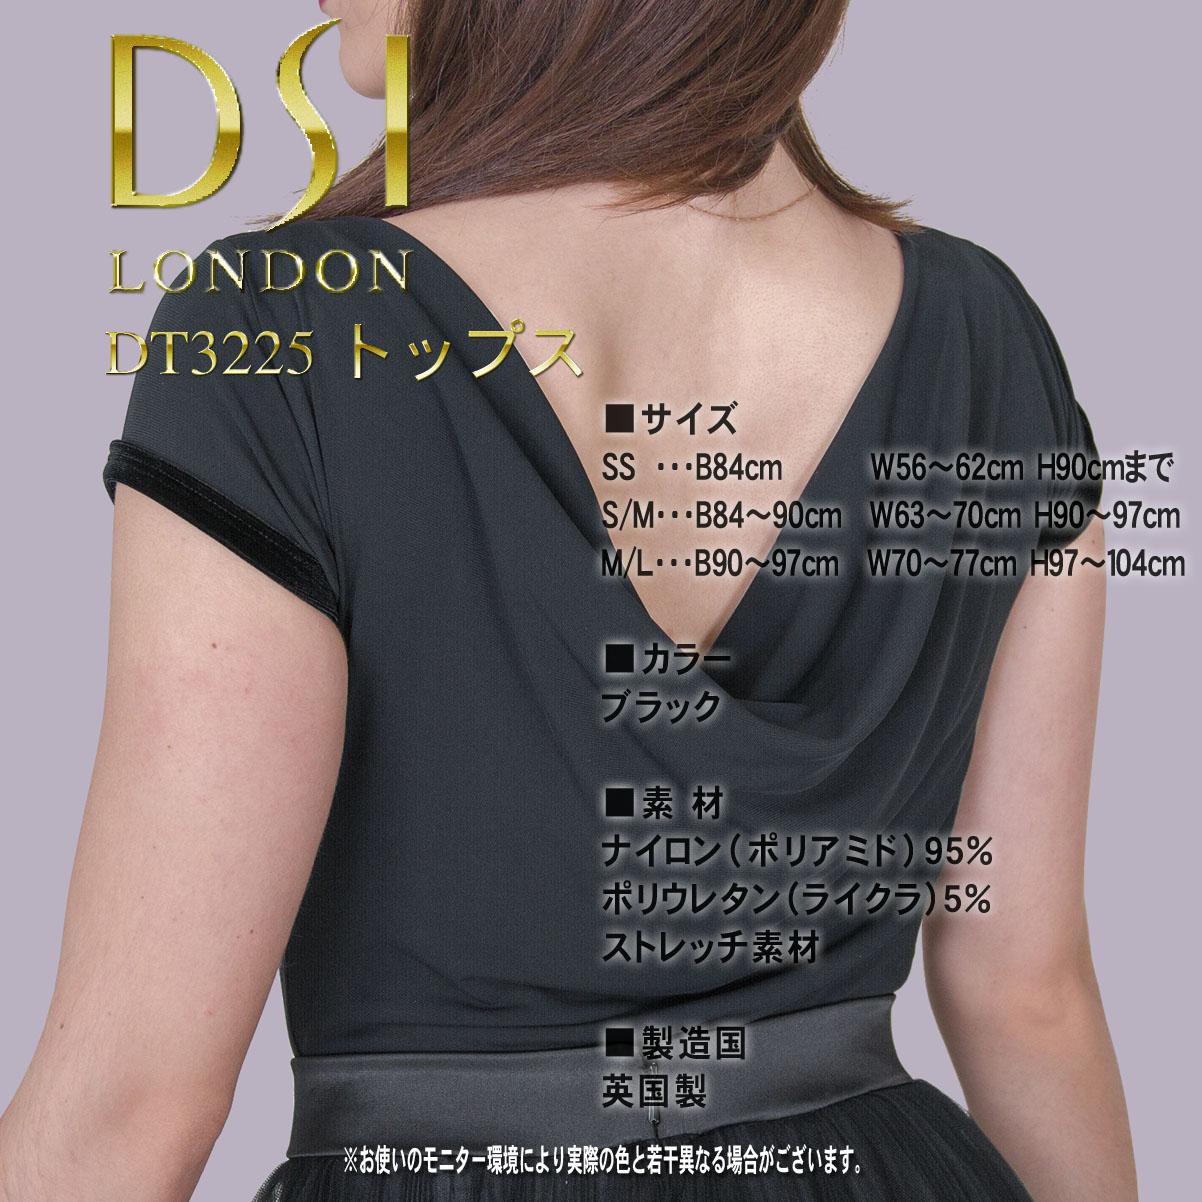 DSI 3225 Tessa Top